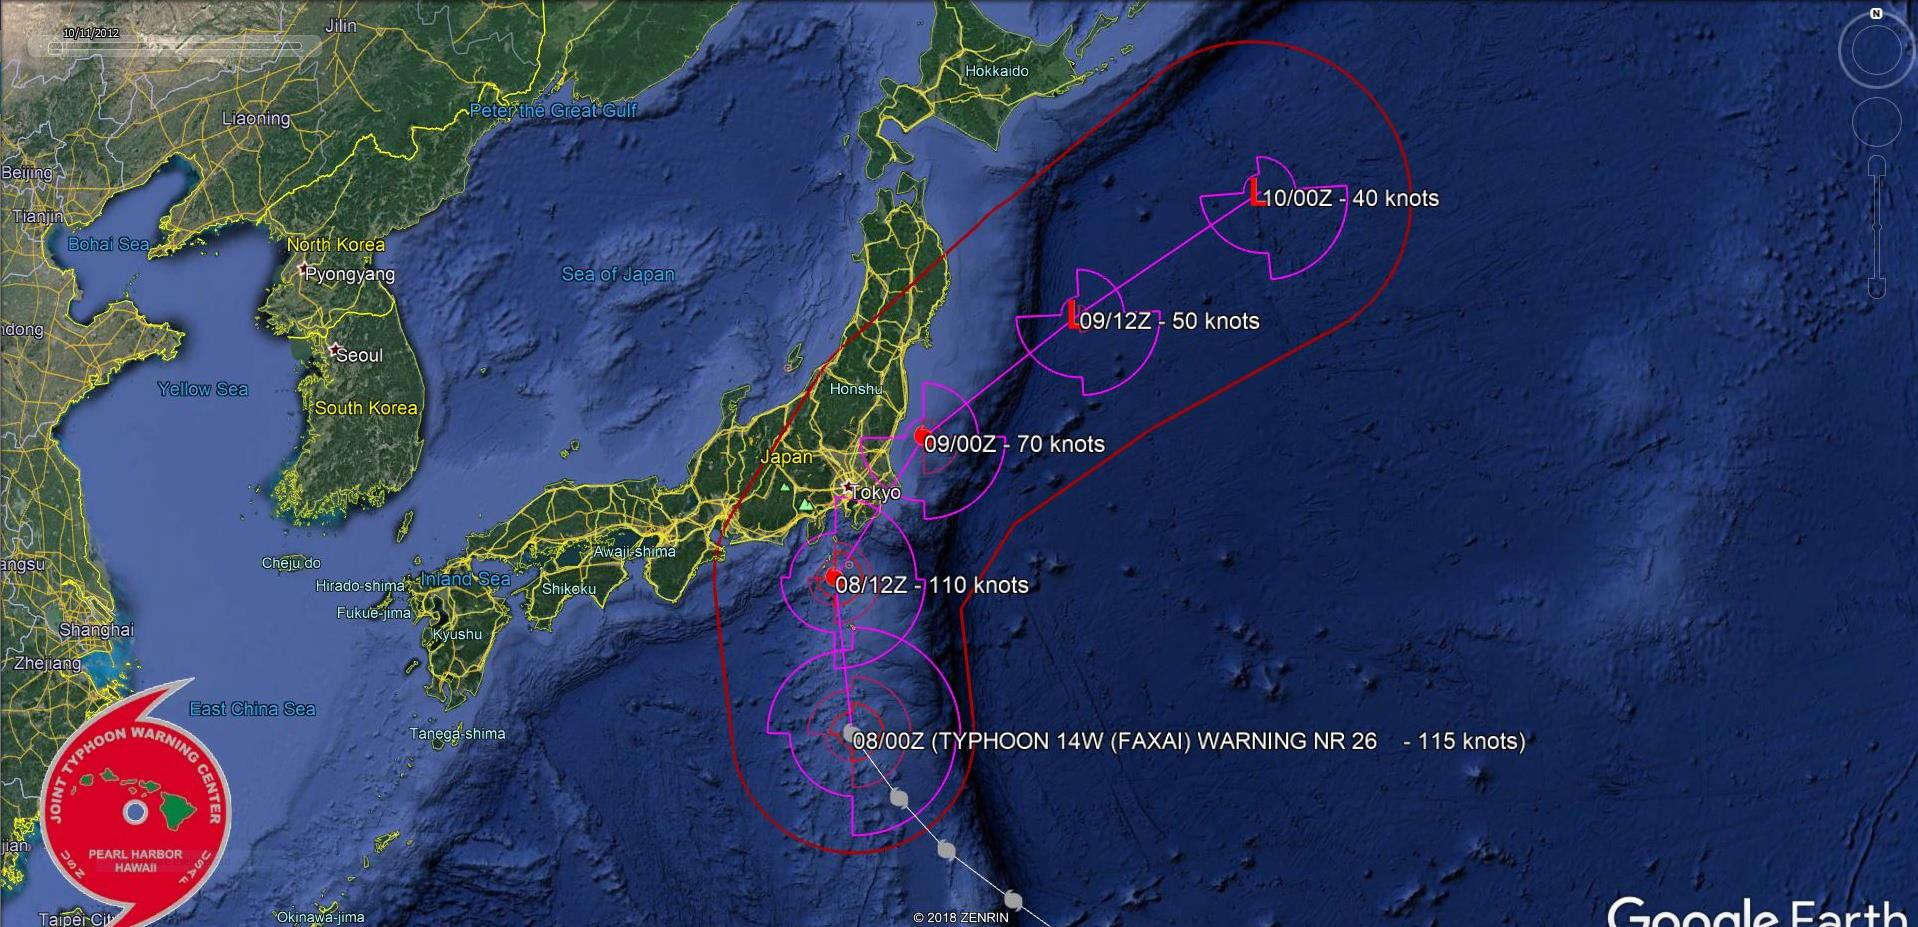 Dangerous Typhoon Faxai is bearing down on the Tokyo area